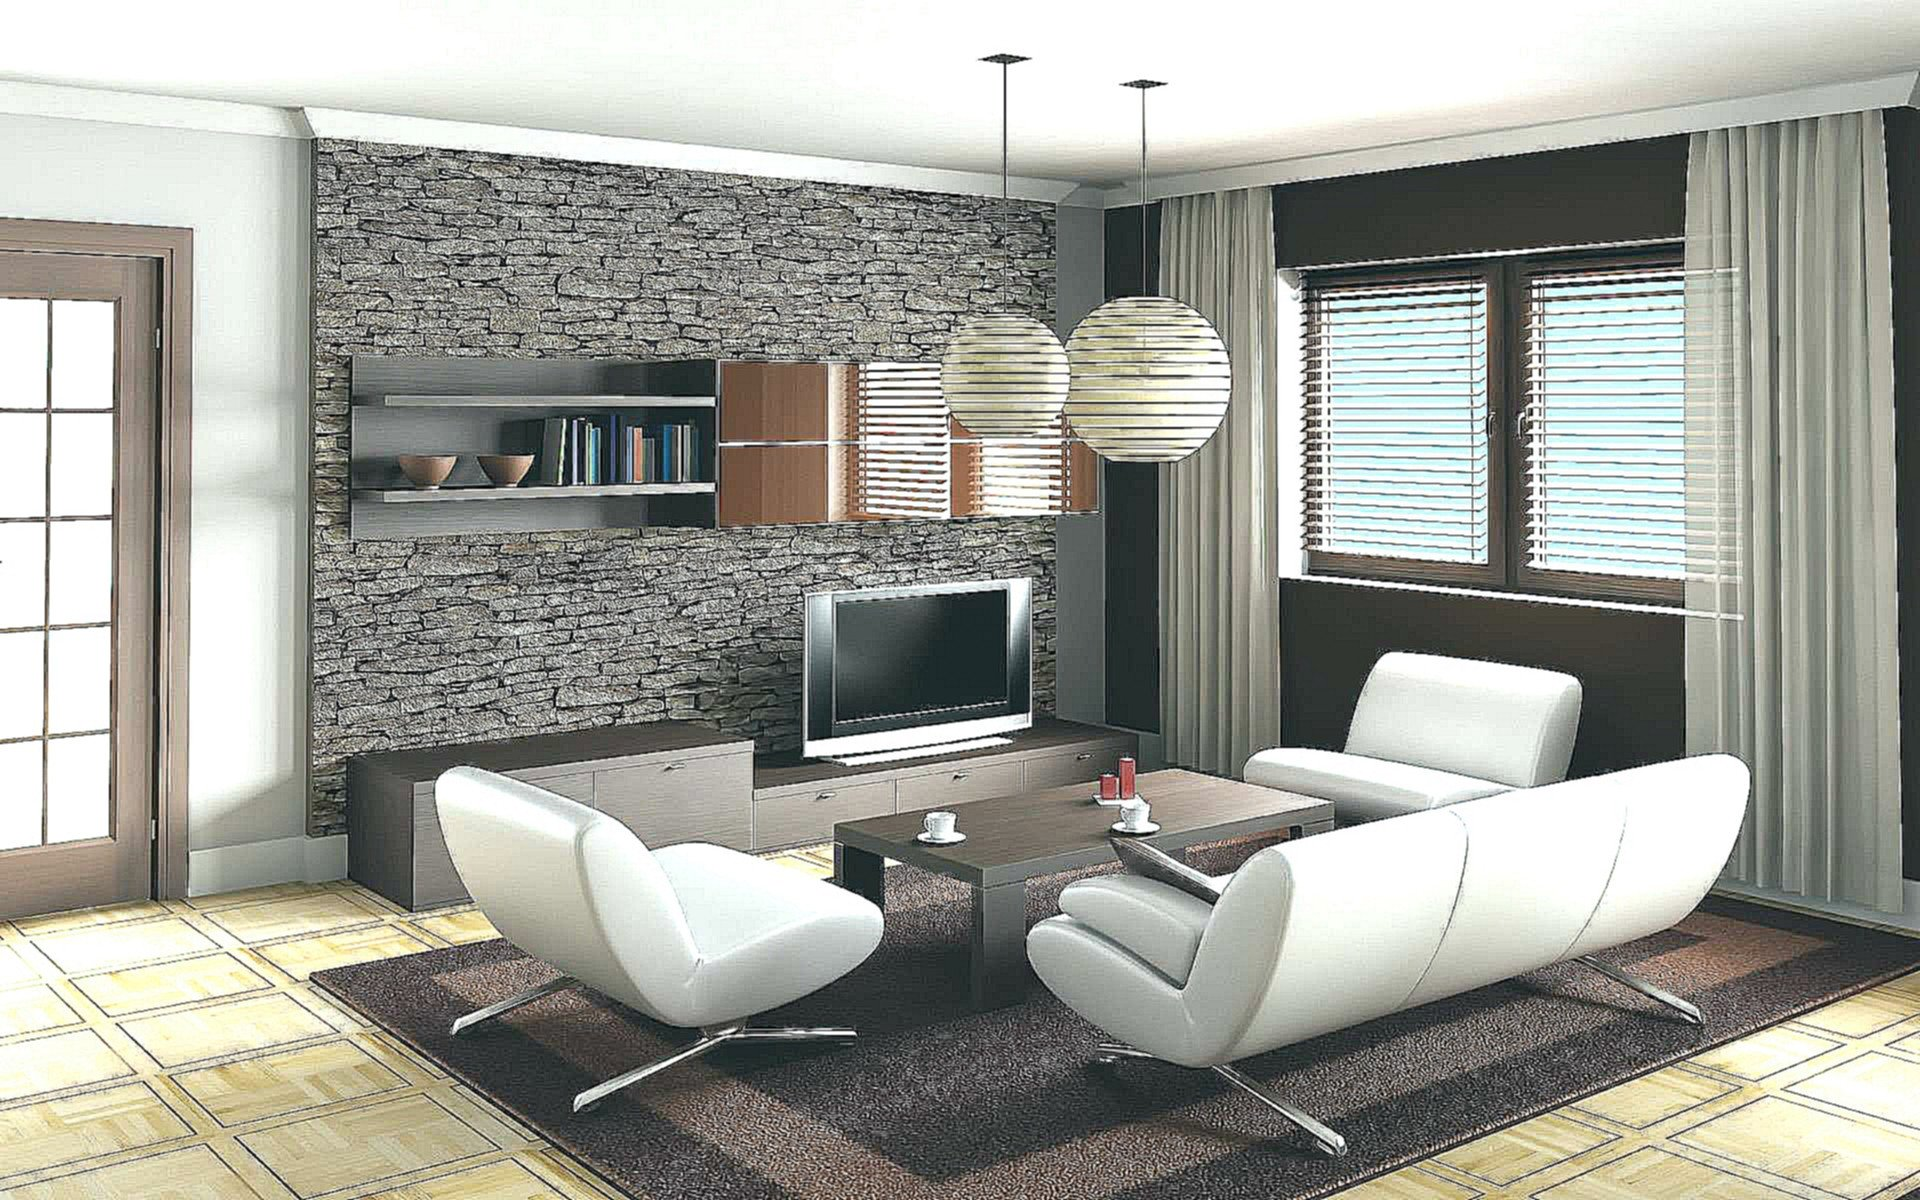 Wallpaper for Living Room Ideas 39 Wallpaper Design for Living Room Contemporary